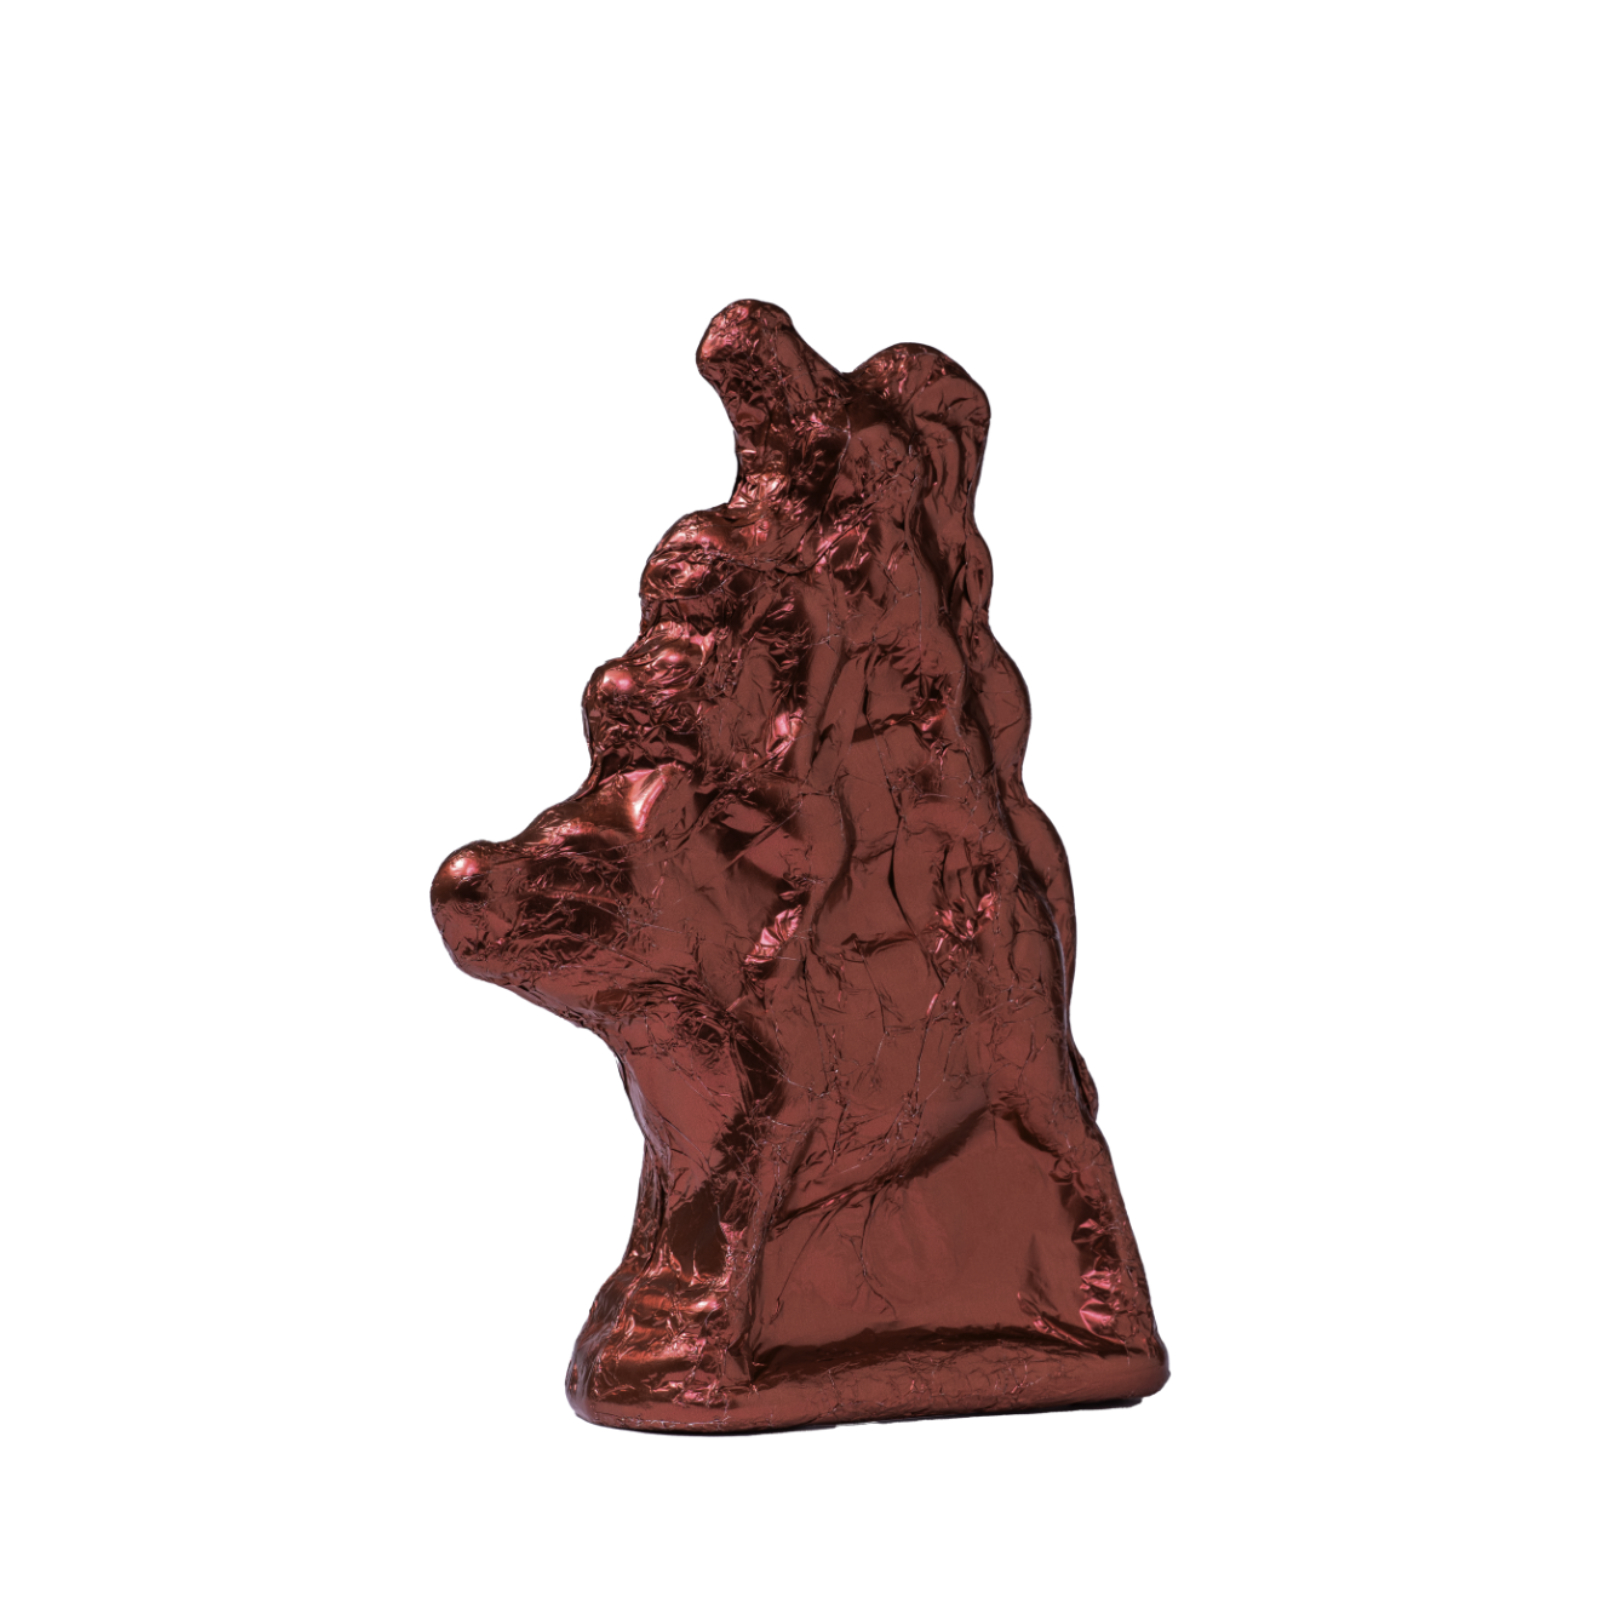 bremer-box-bremer-stadtmusikanten-schokolade-figur-karminrot